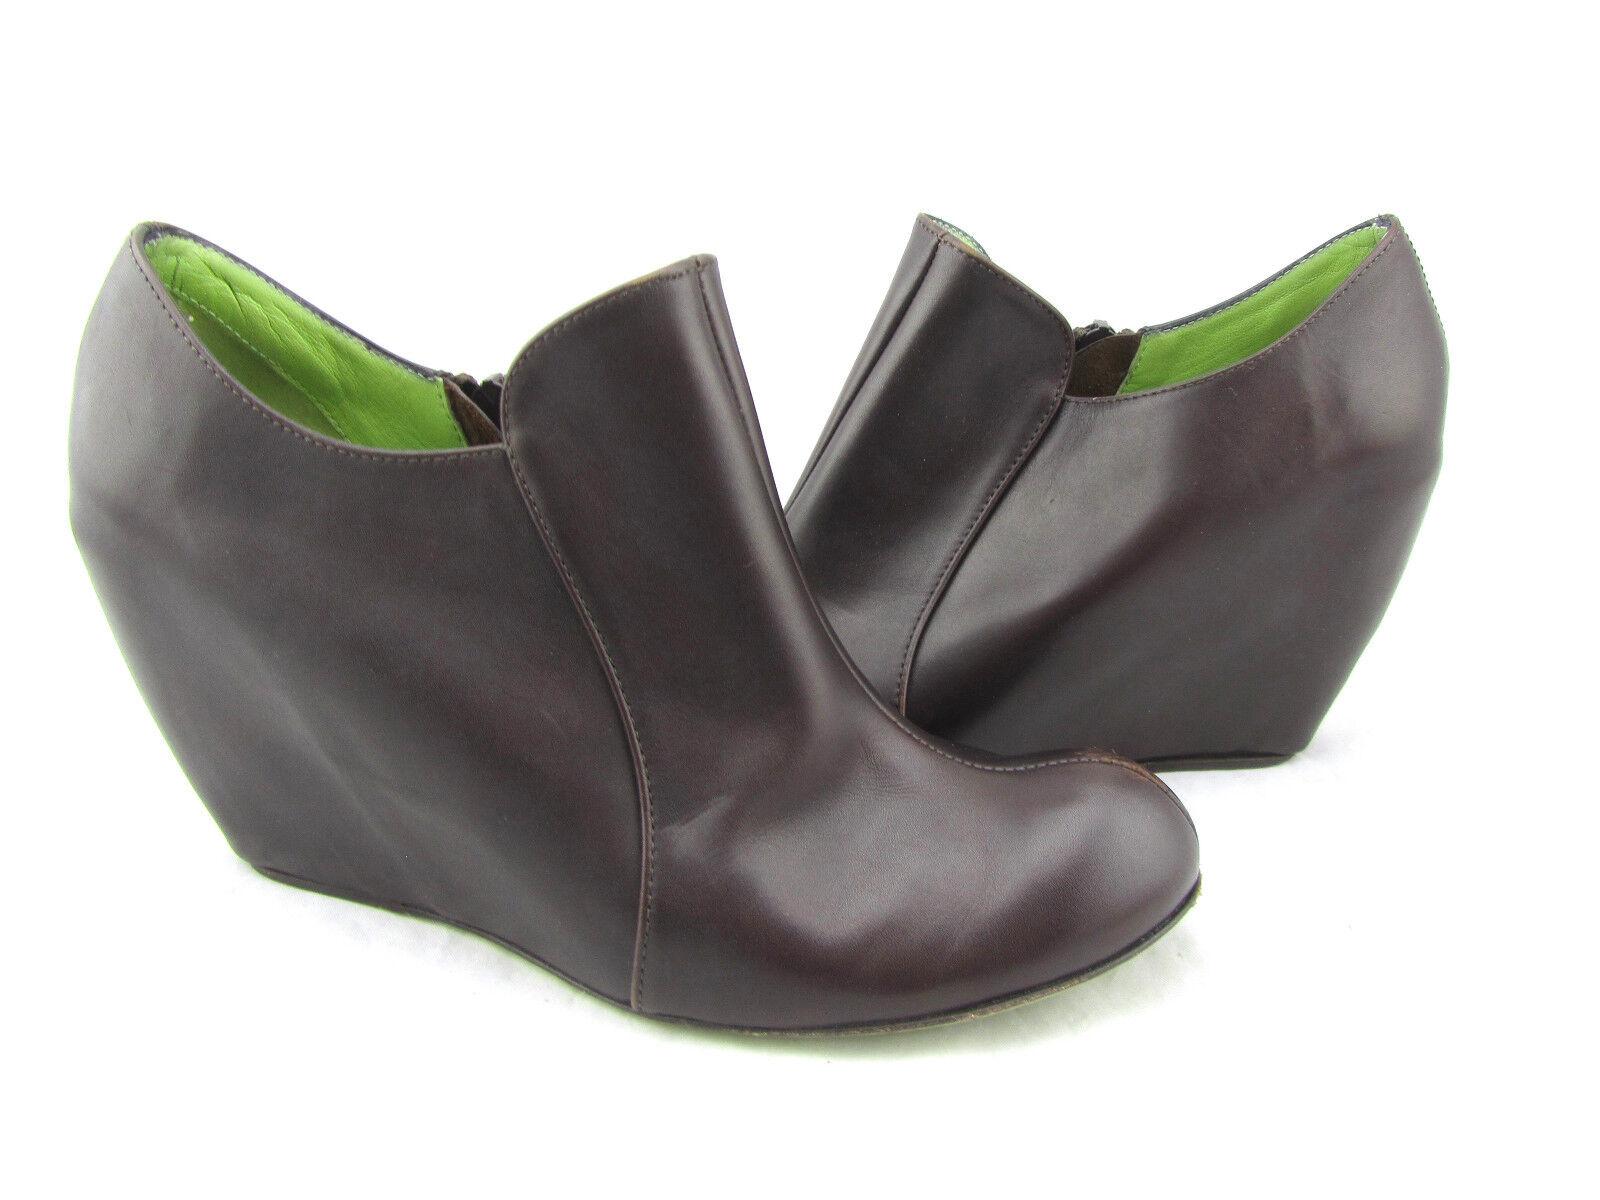 268 LEOPOLDO GIORDANO GIORDANO GIORDANO Oregon braun Leather Ankle Wedges Stiefelies Stiefel schuhe 7 38 3d97c3